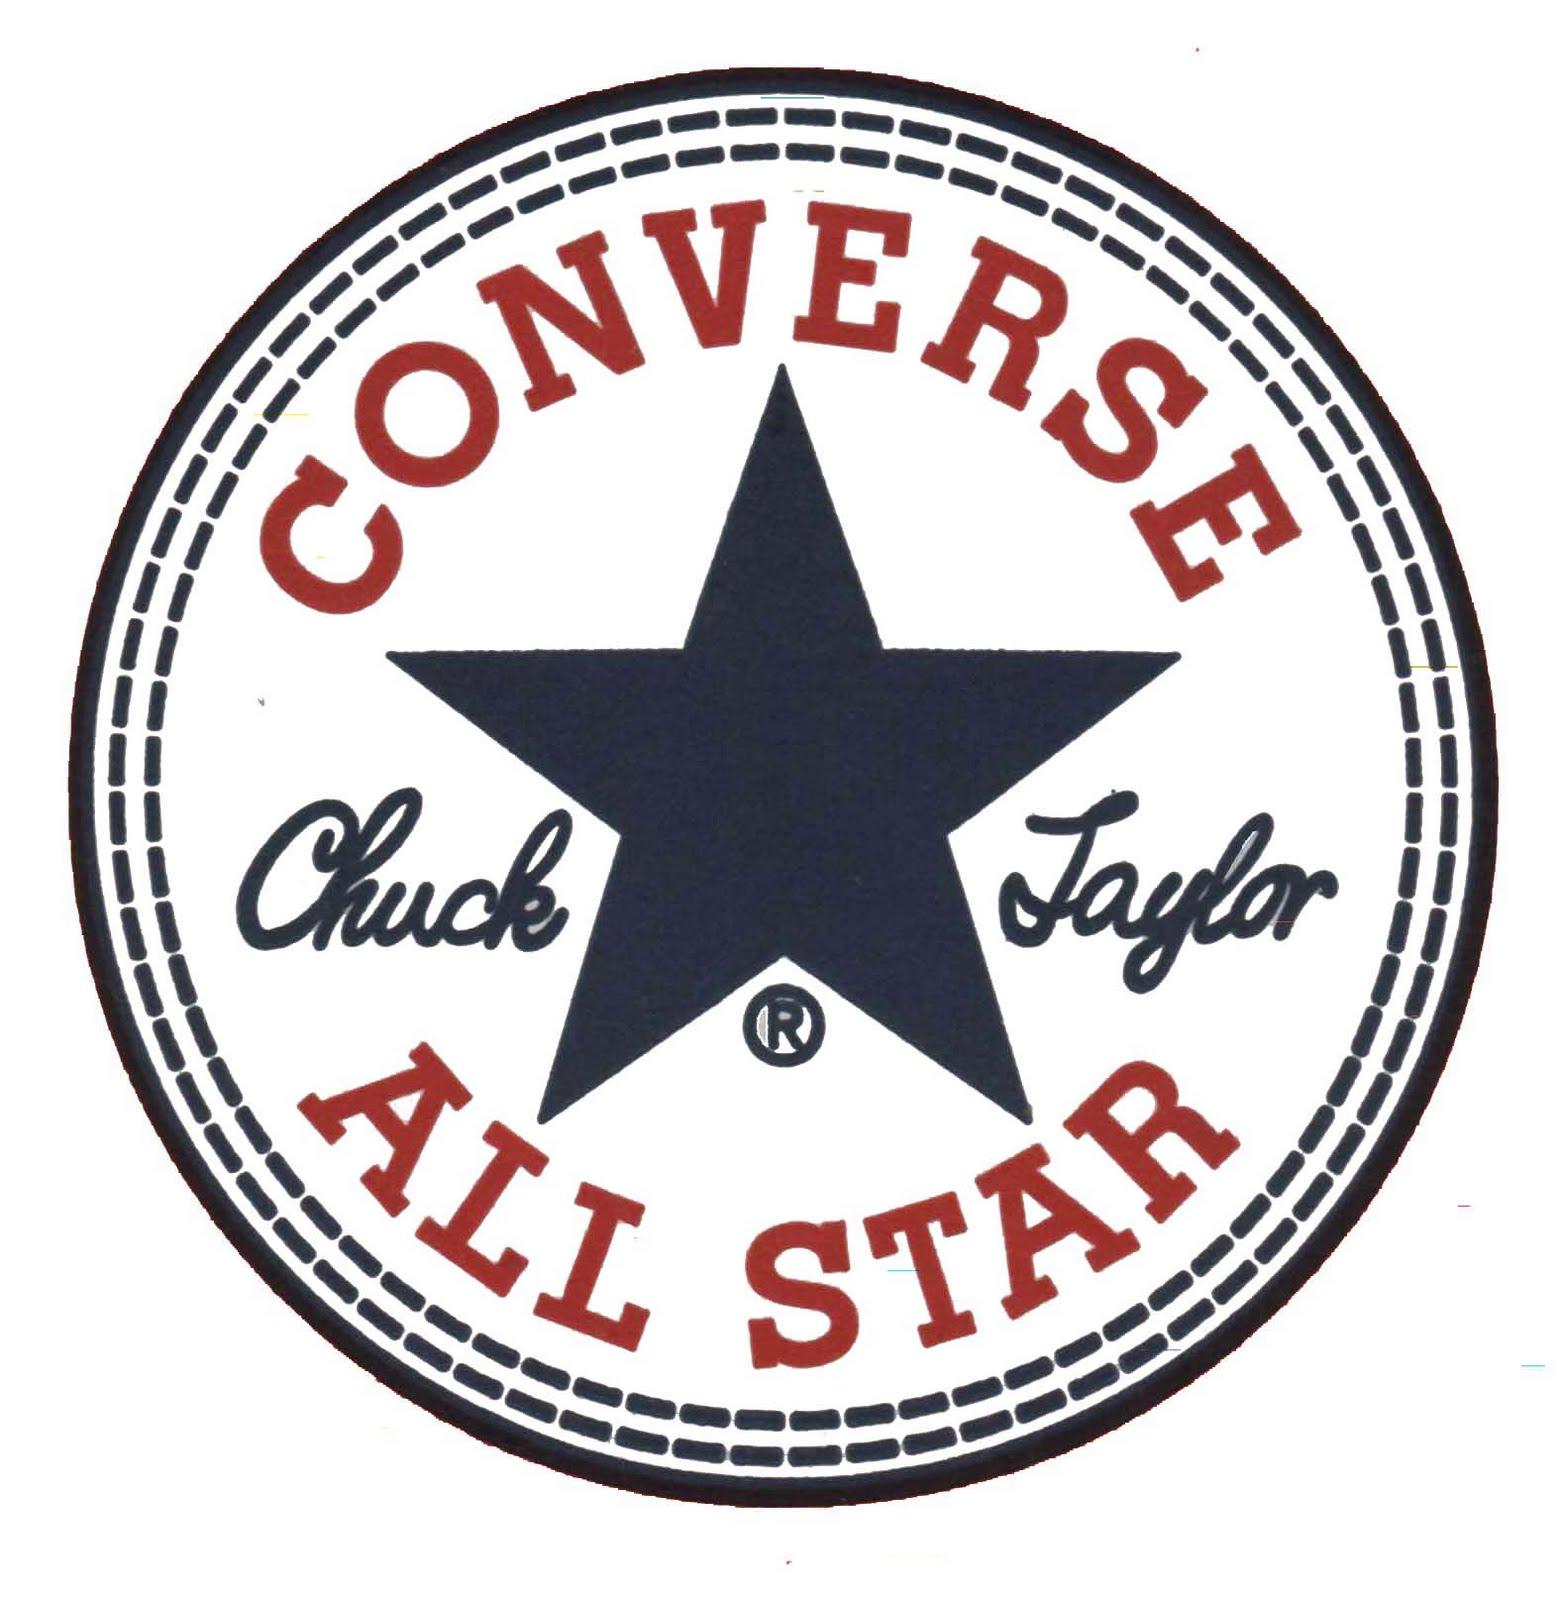 converse BY Sia: ประวัติ รองเท้า(Converse)